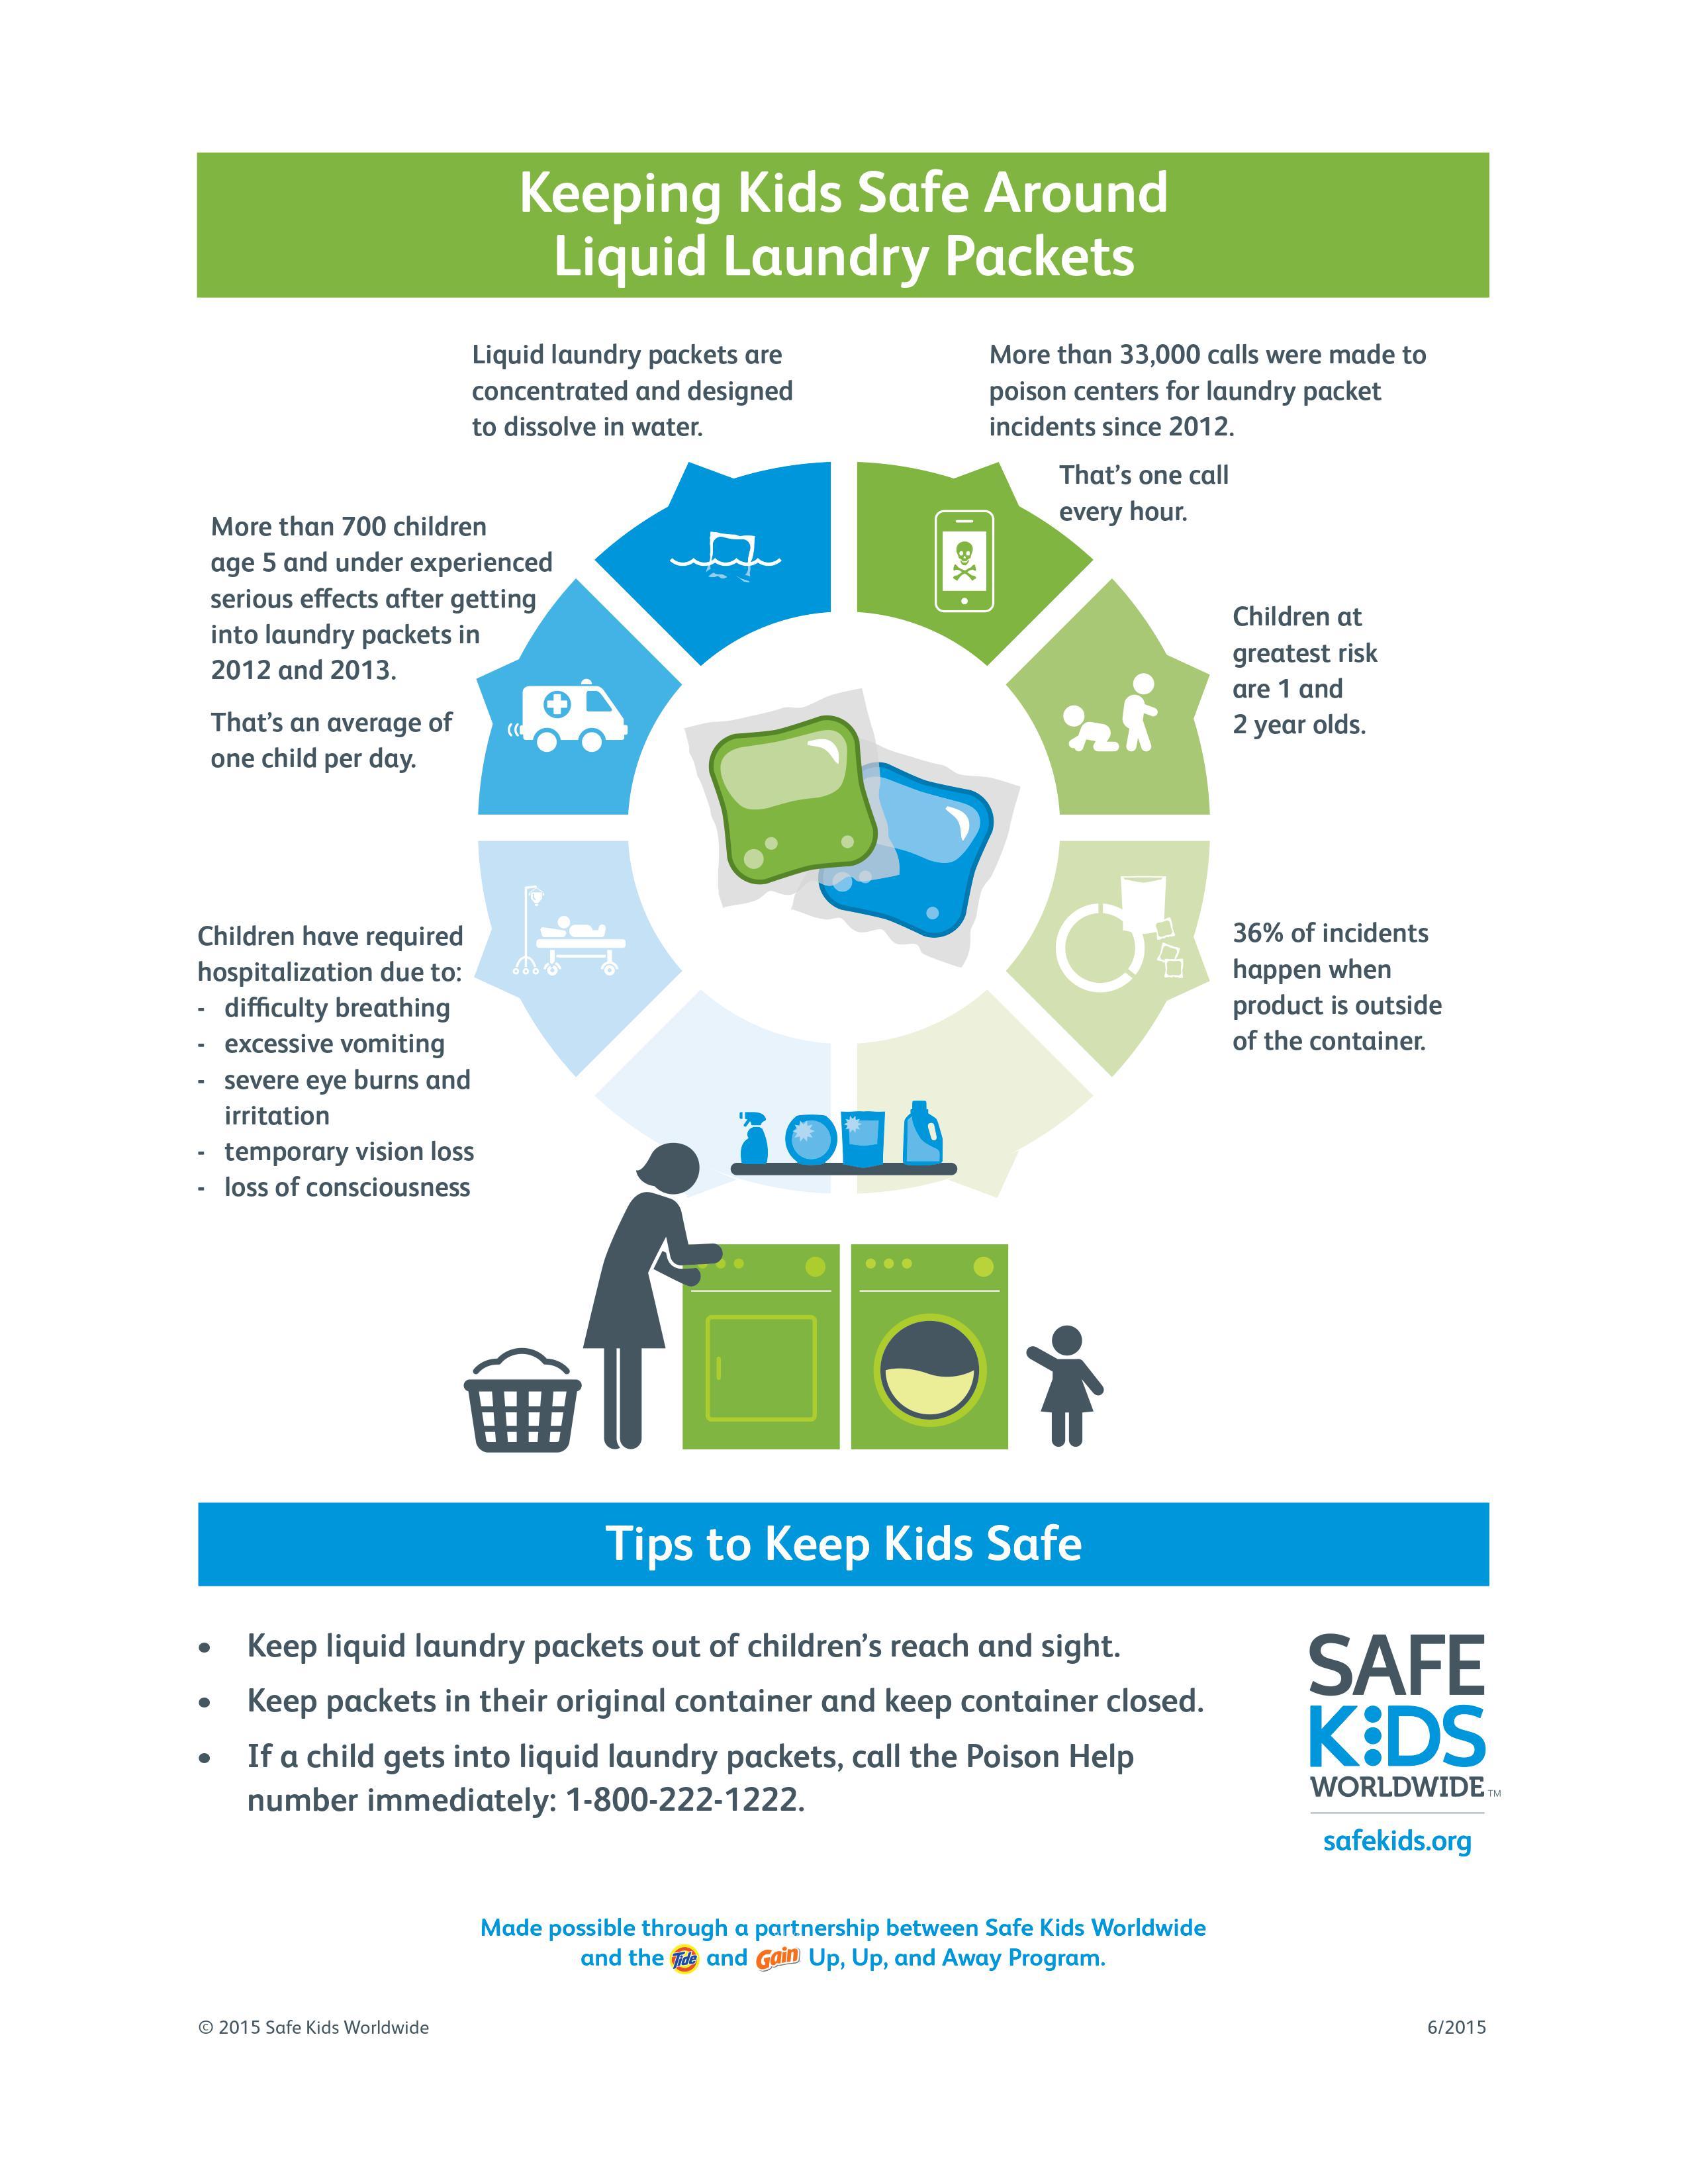 Keeping Kids Safe Around Liquid Laundry Packets